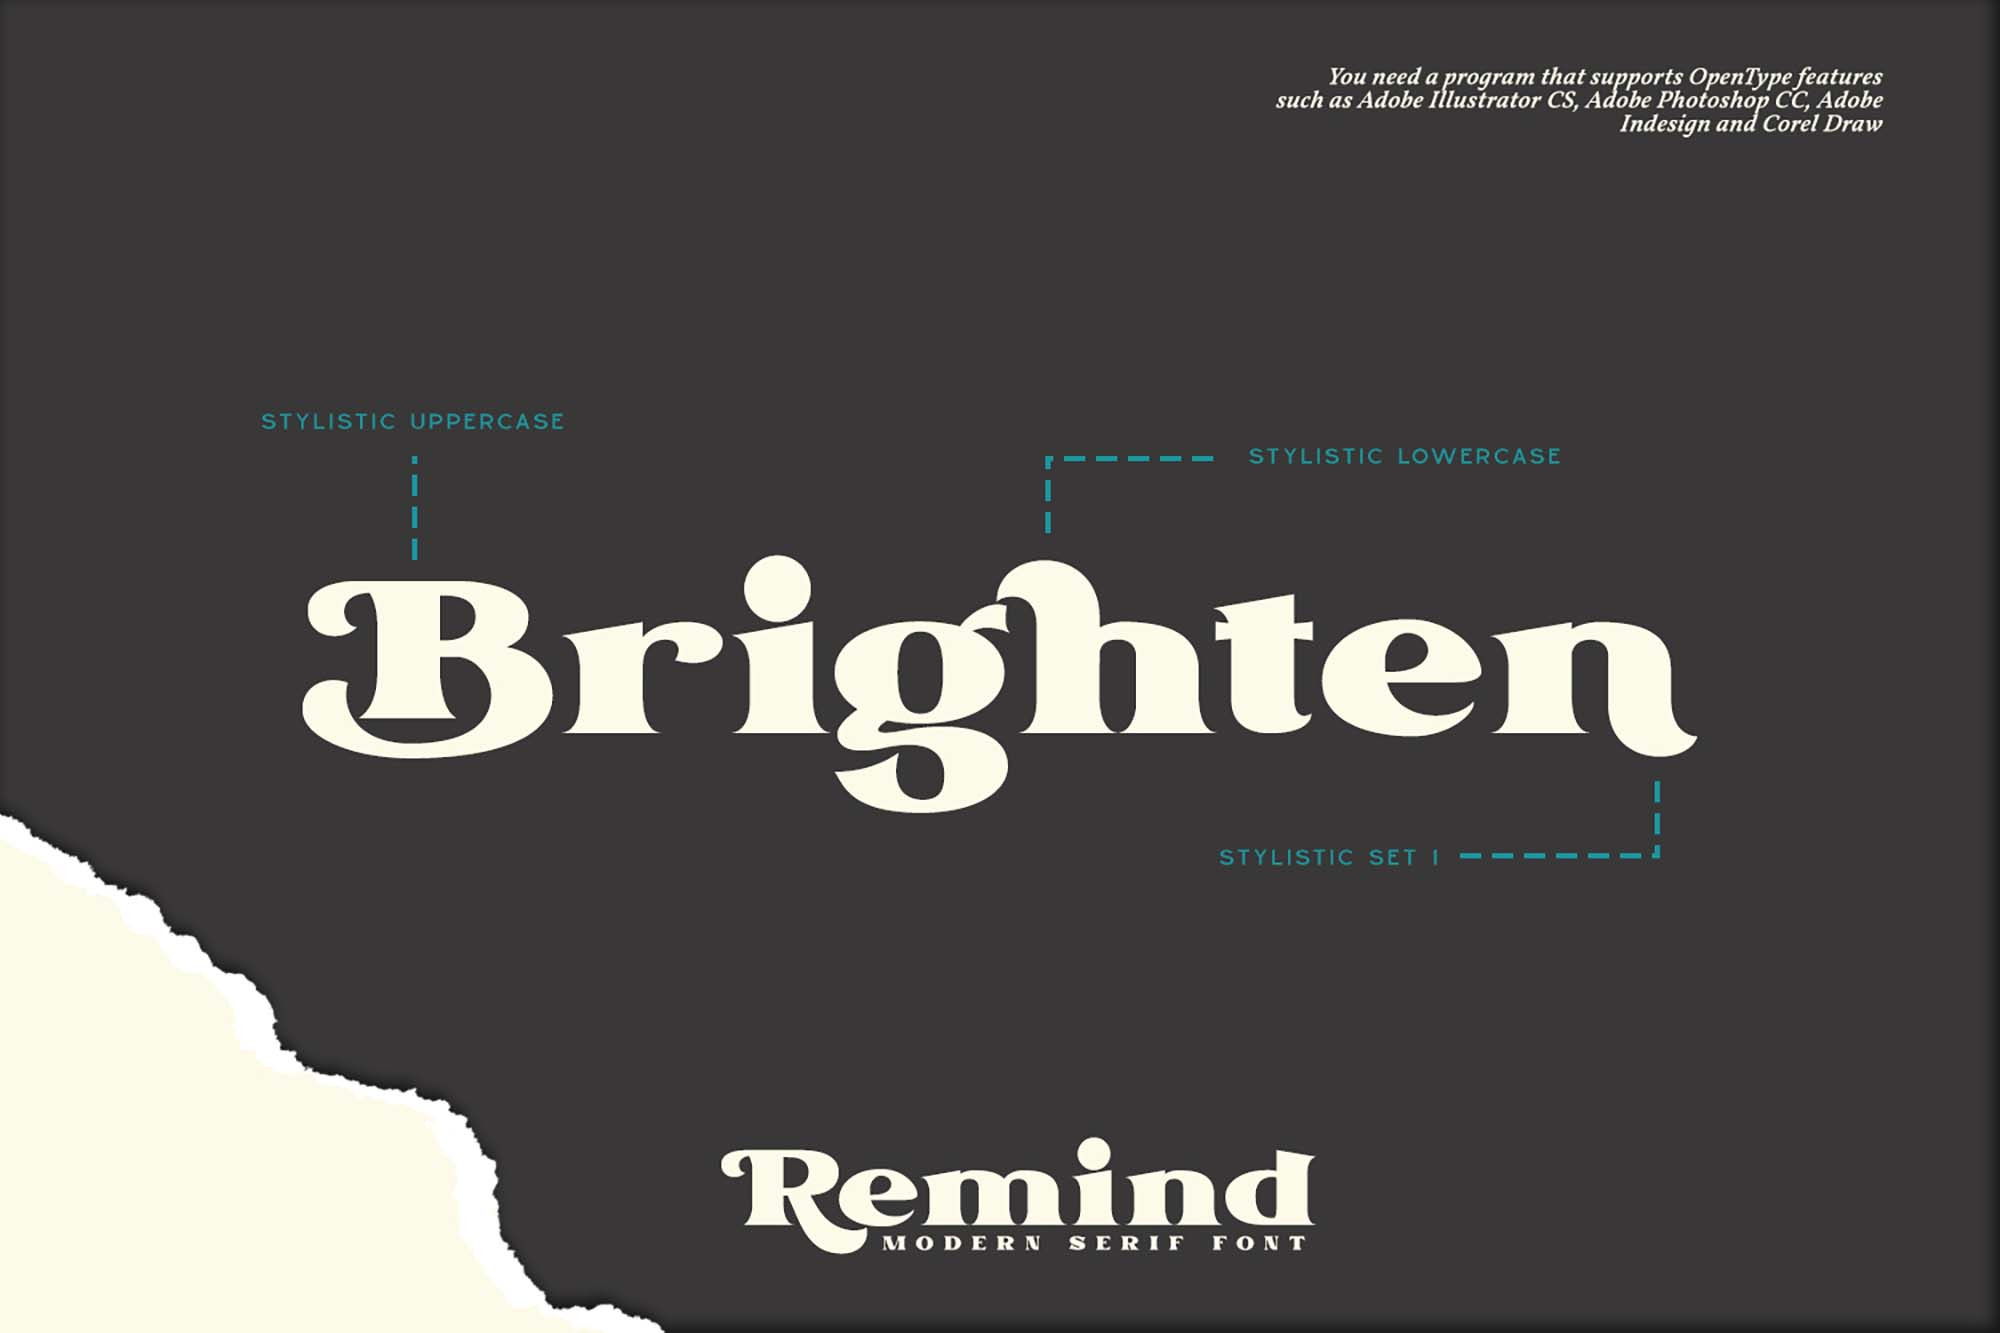 Remind Serif Font 4